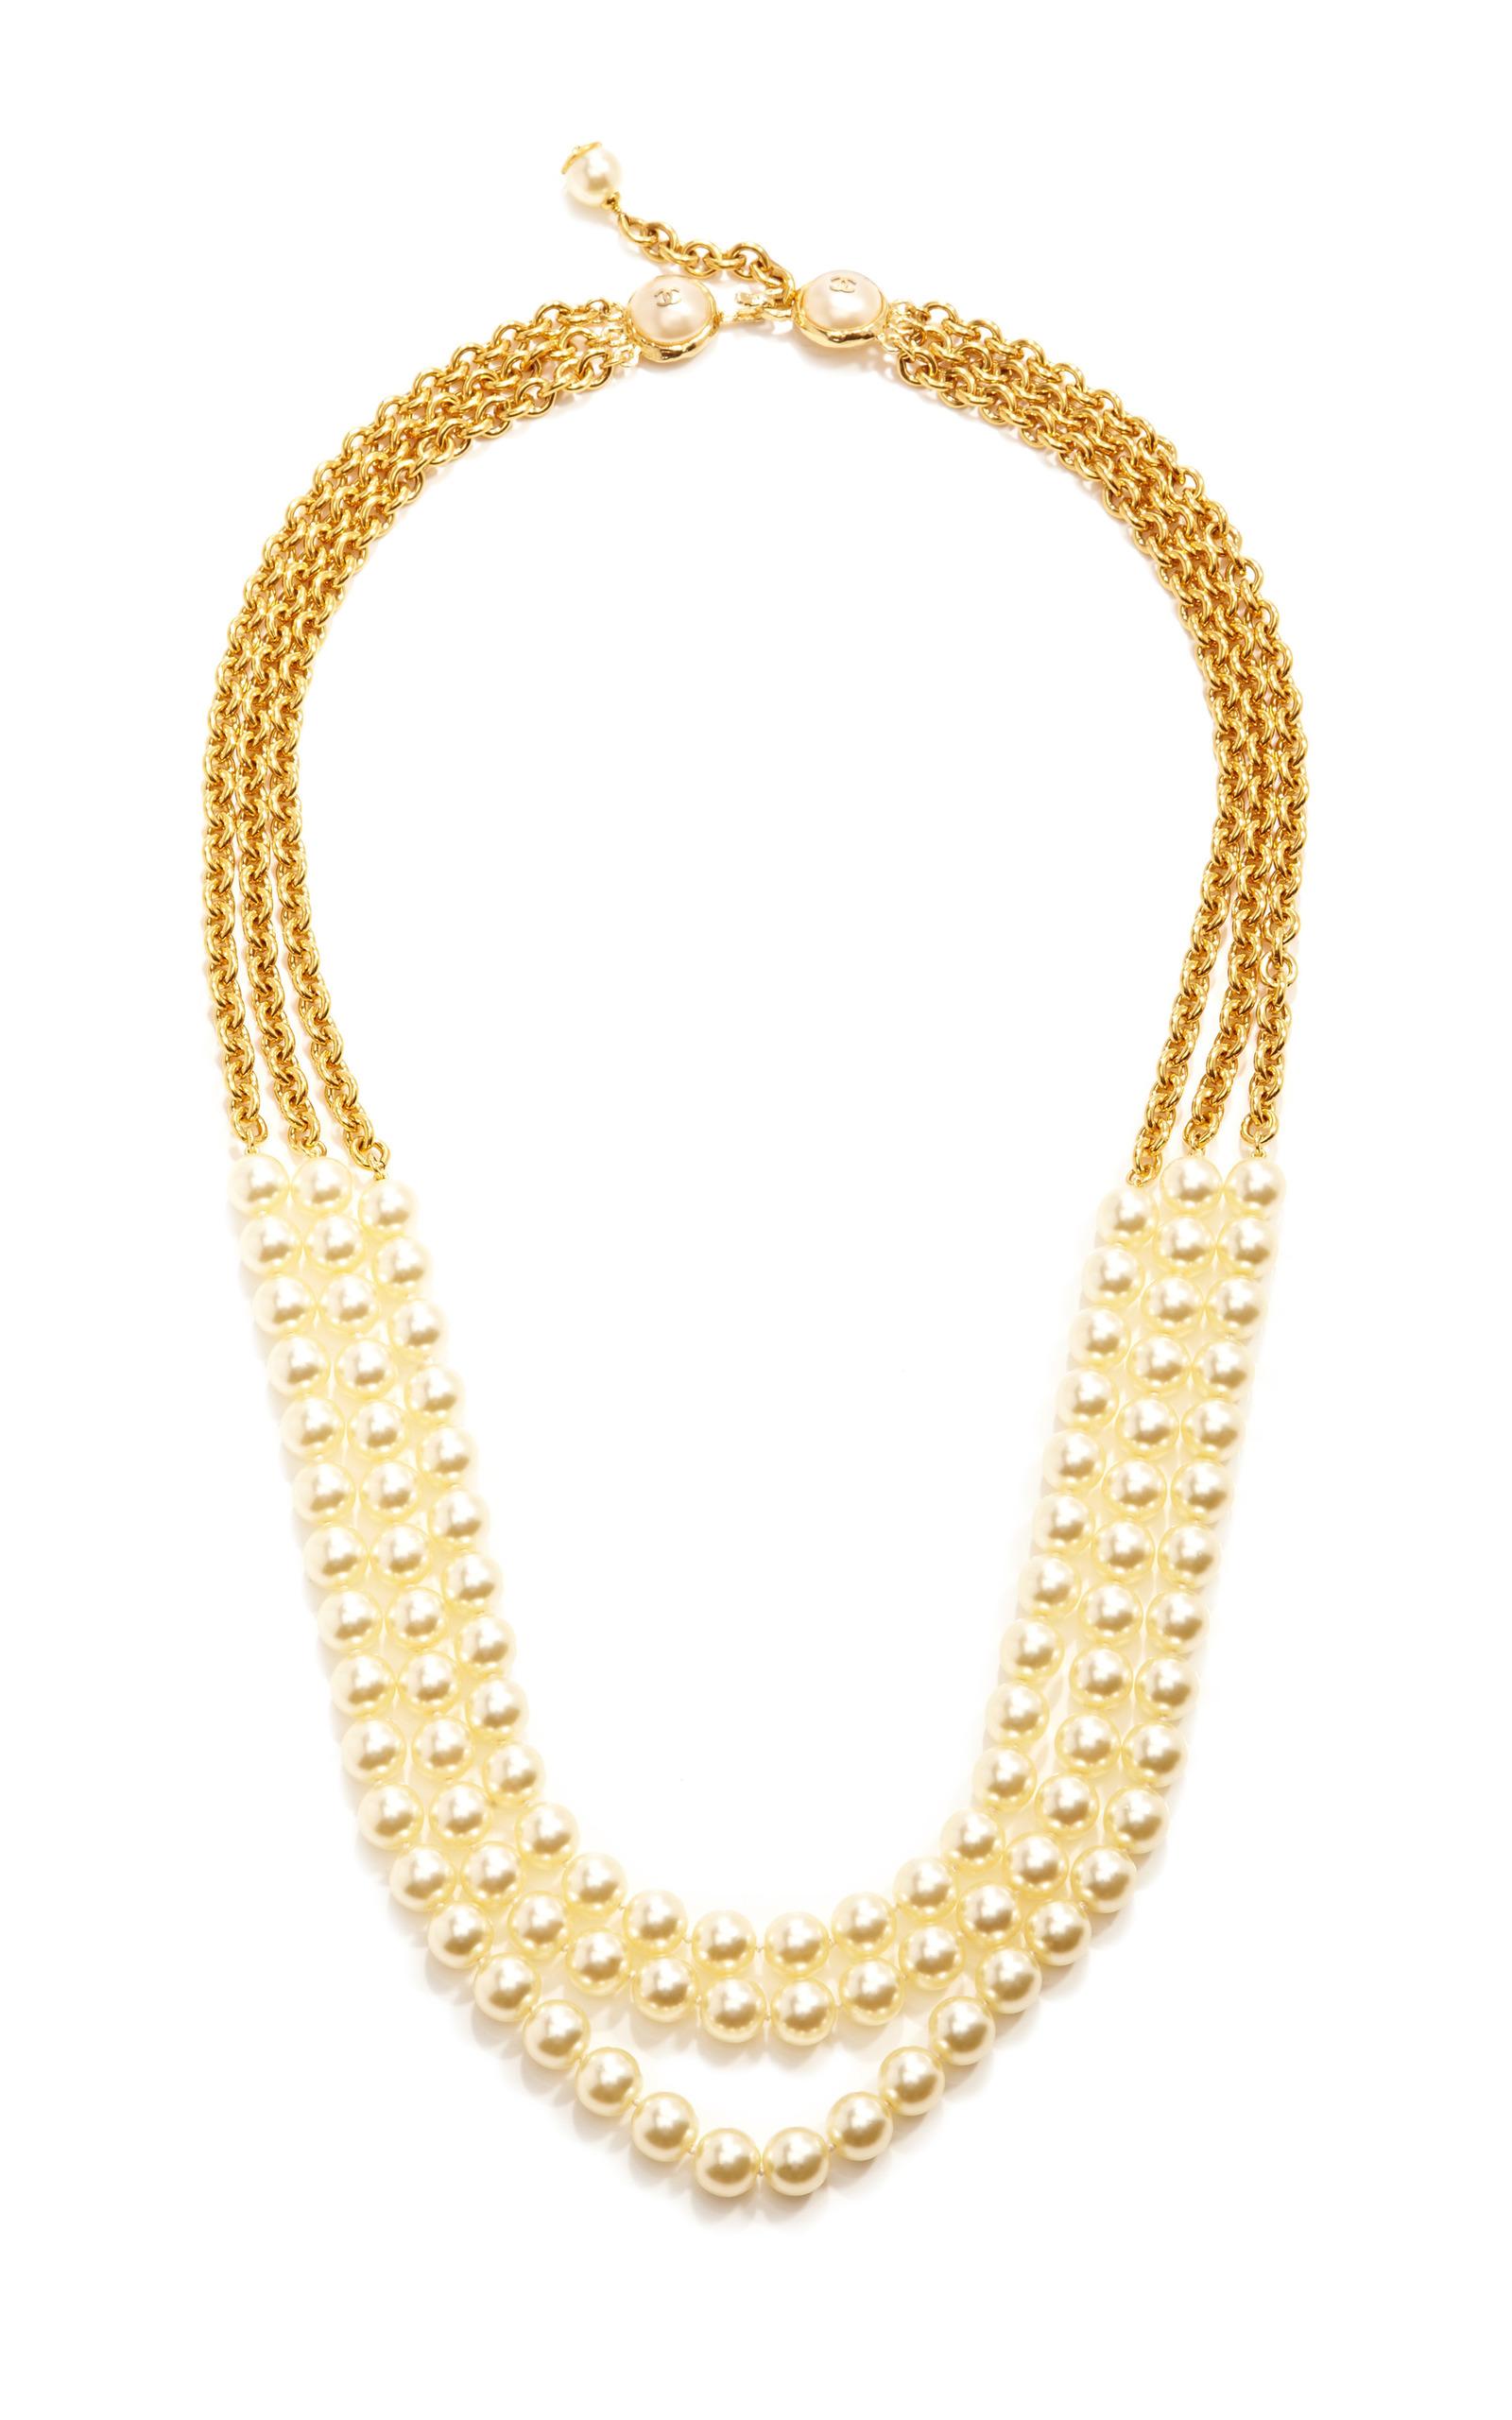 Vintage Chanel Three Strand Pearl Necklace By Moda Operandi